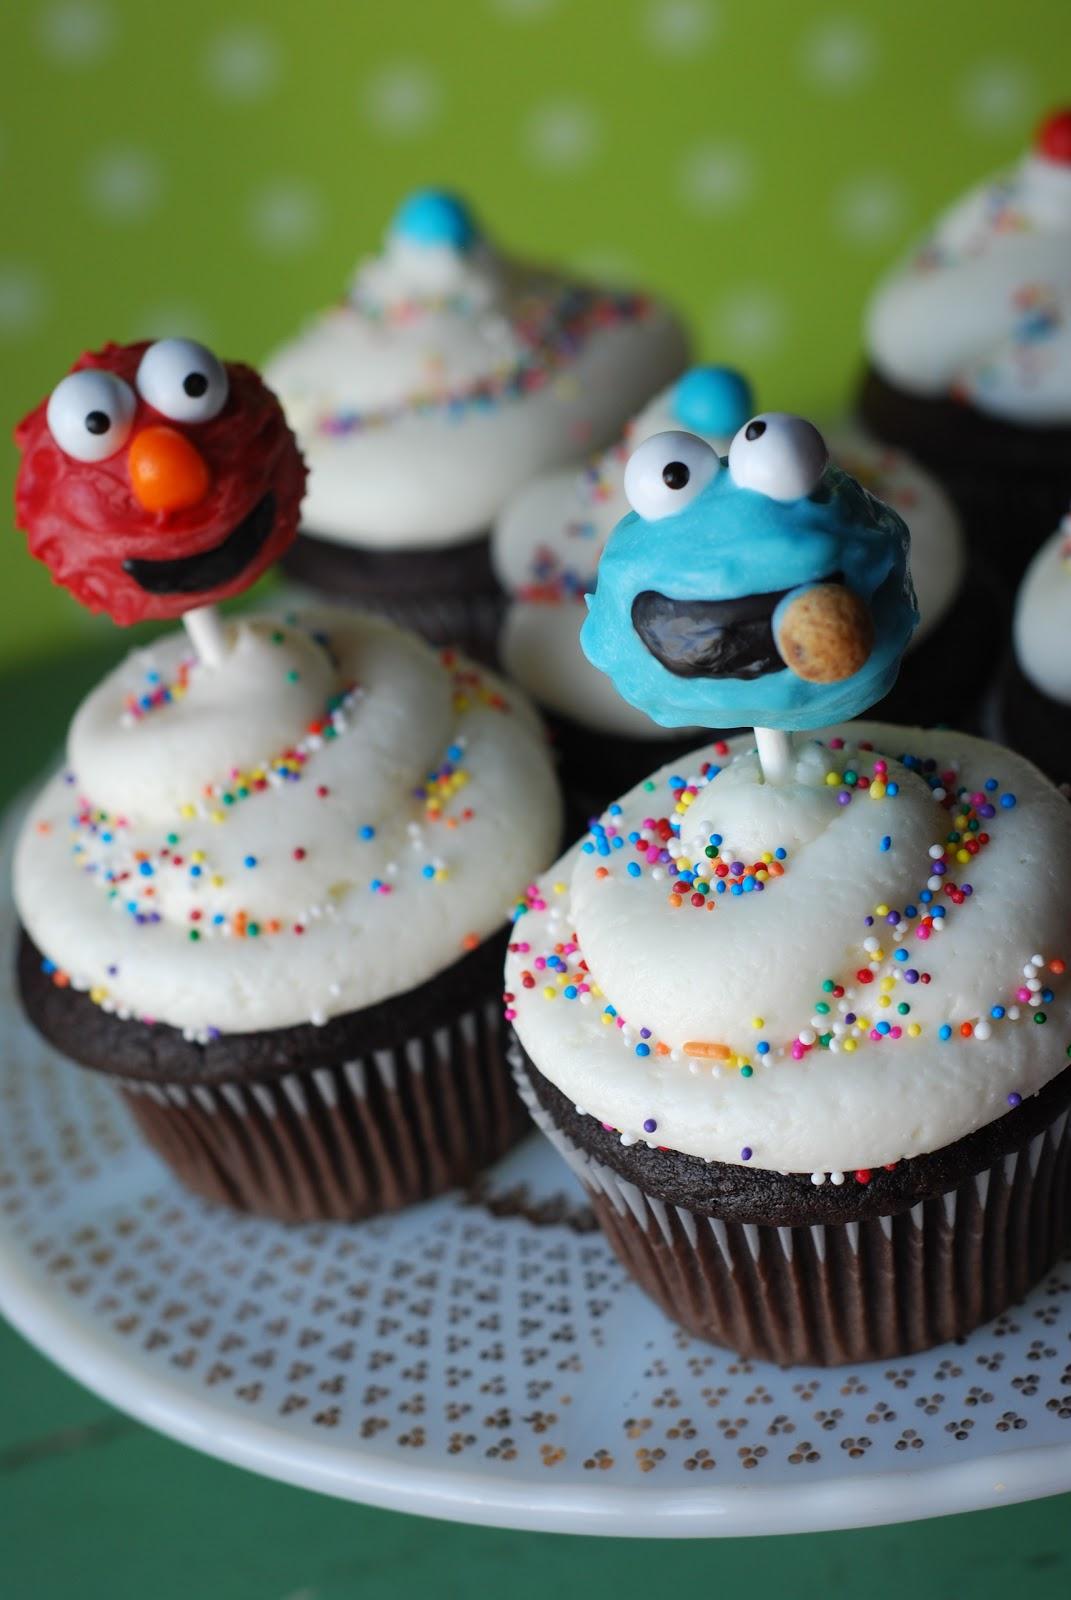 Sweet Cheeks Tasty Treats Cake Pops And Cupcakes Unite